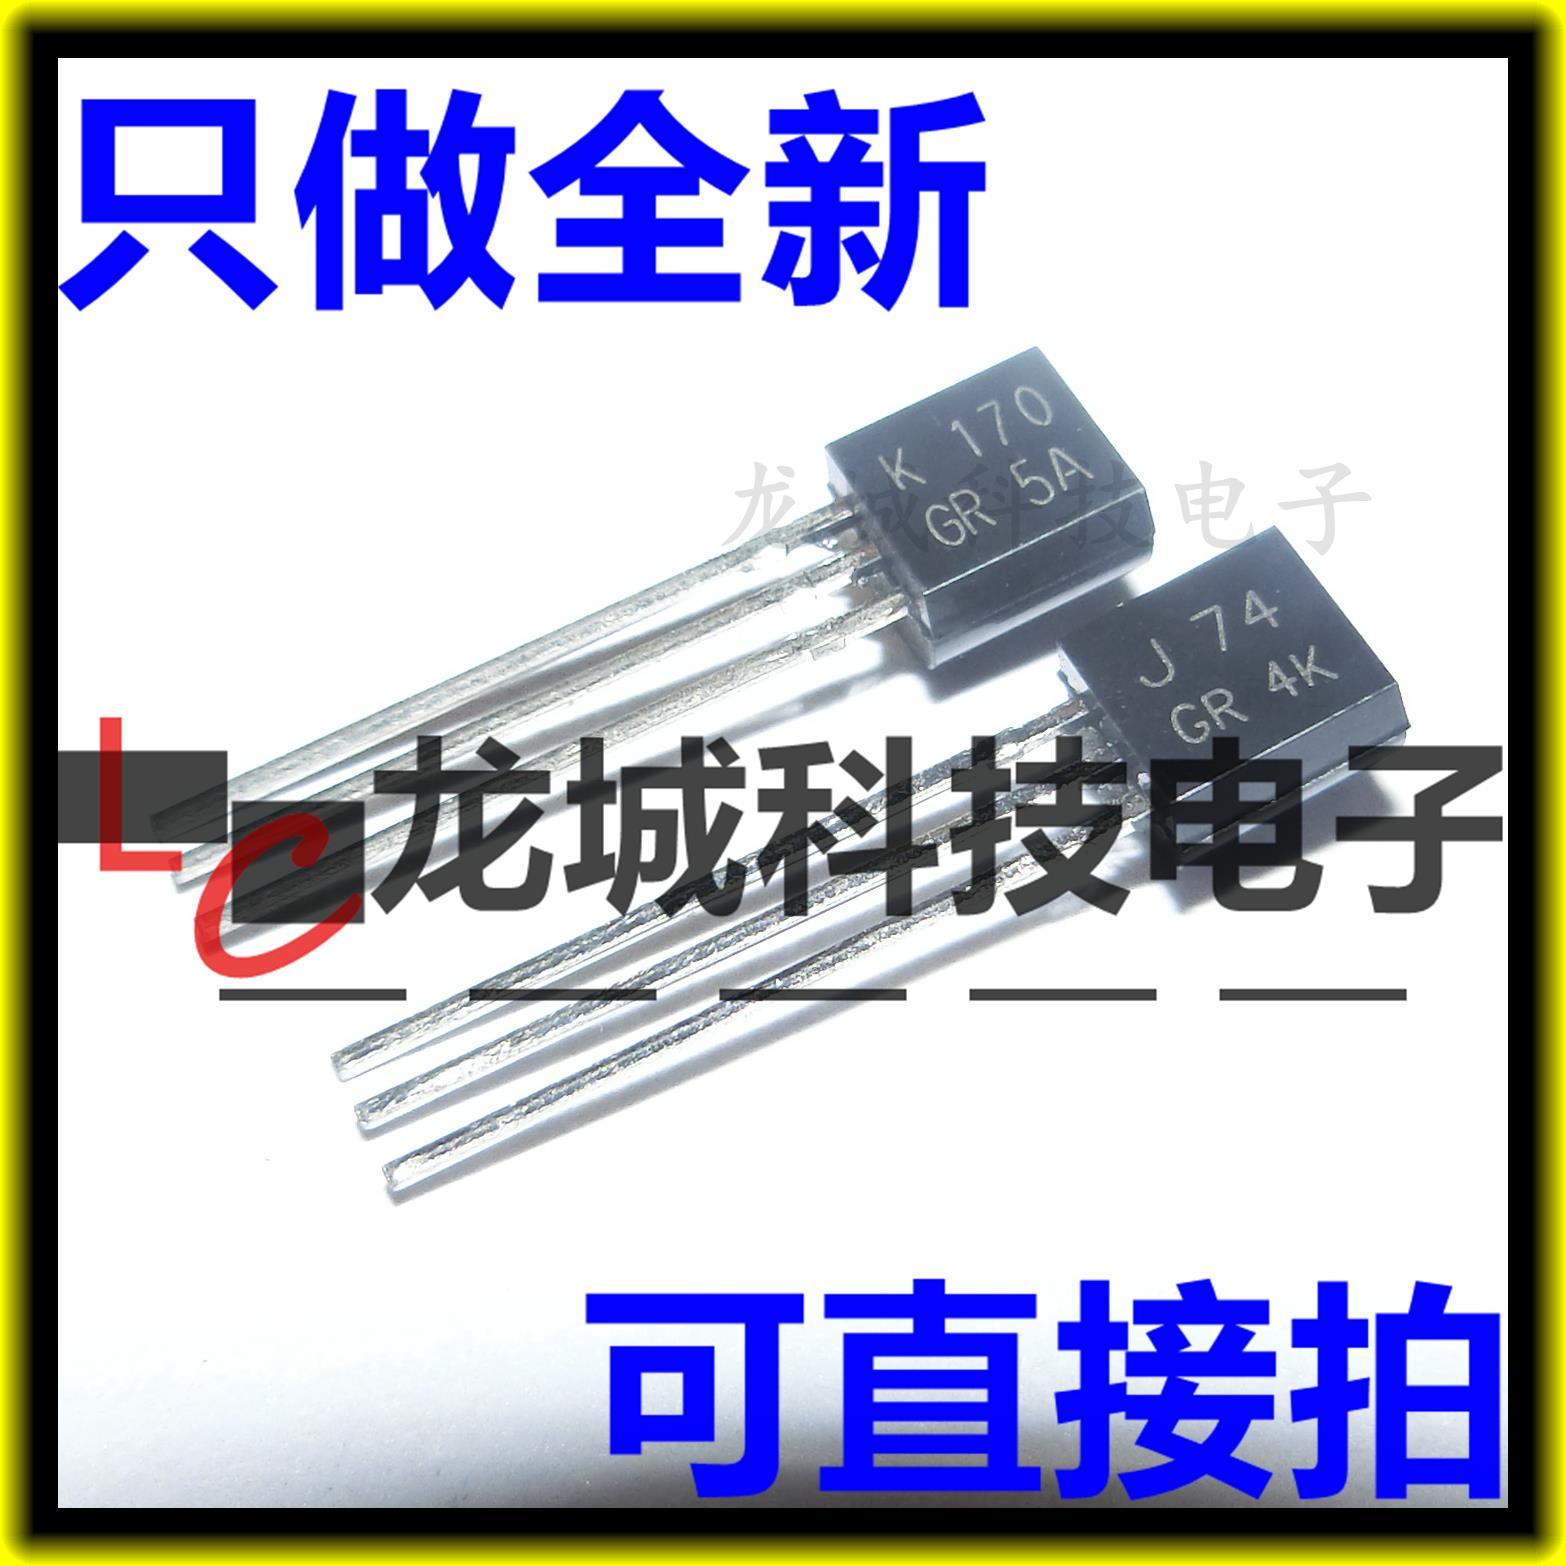 2SK170/2SJ74 K170-GR/J74-GR TO-92